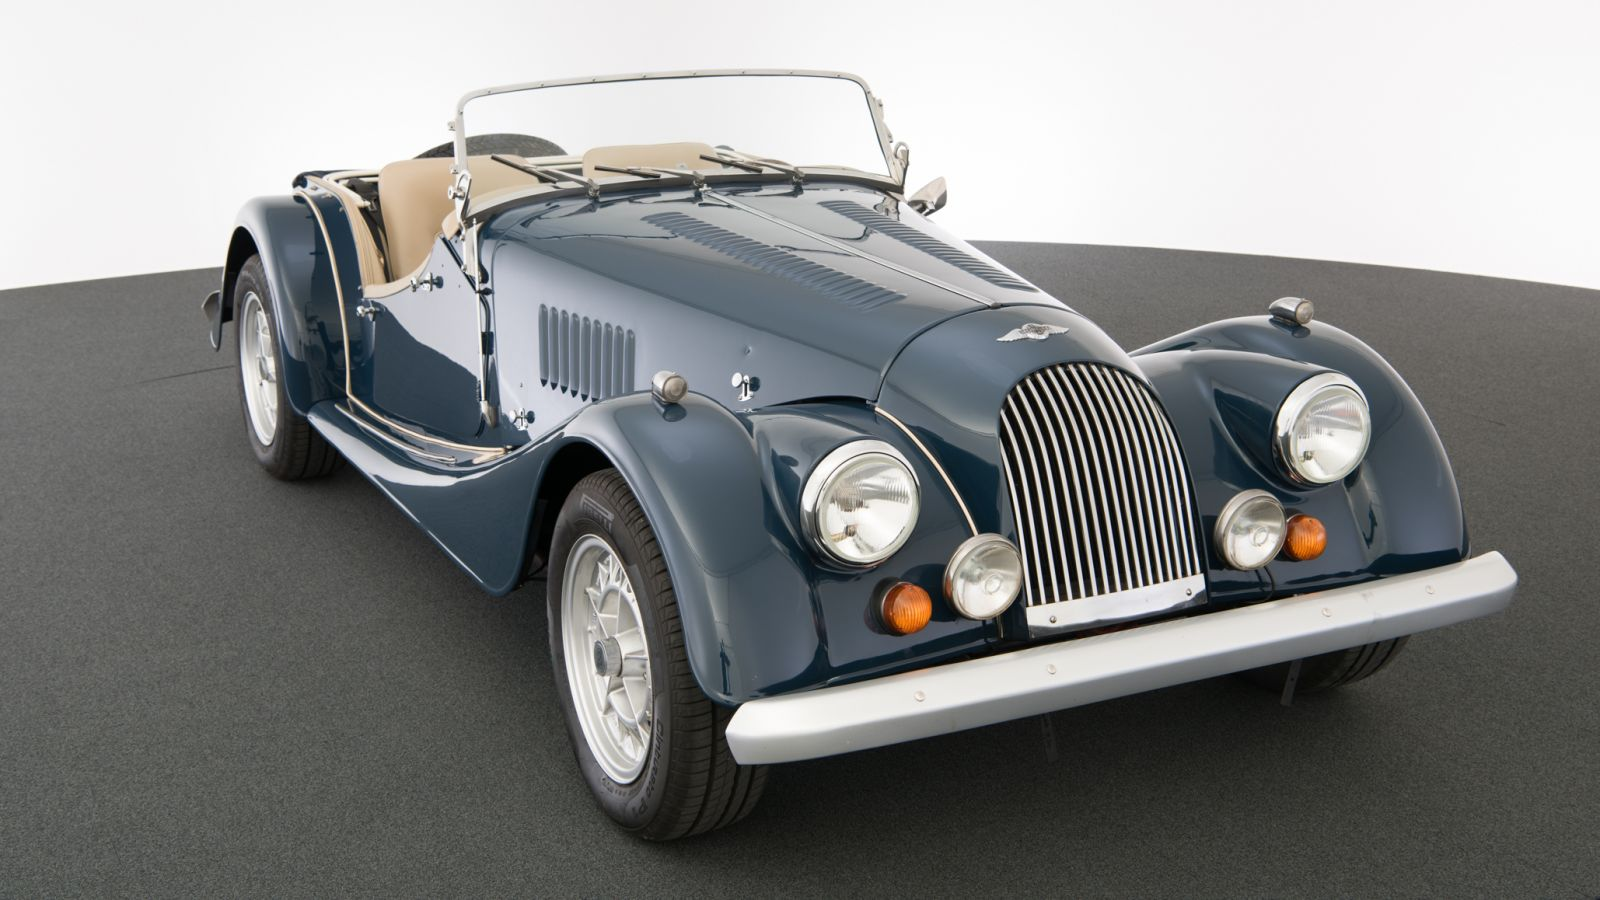 dream garage sold carsmorgan morgan plus 8. Black Bedroom Furniture Sets. Home Design Ideas